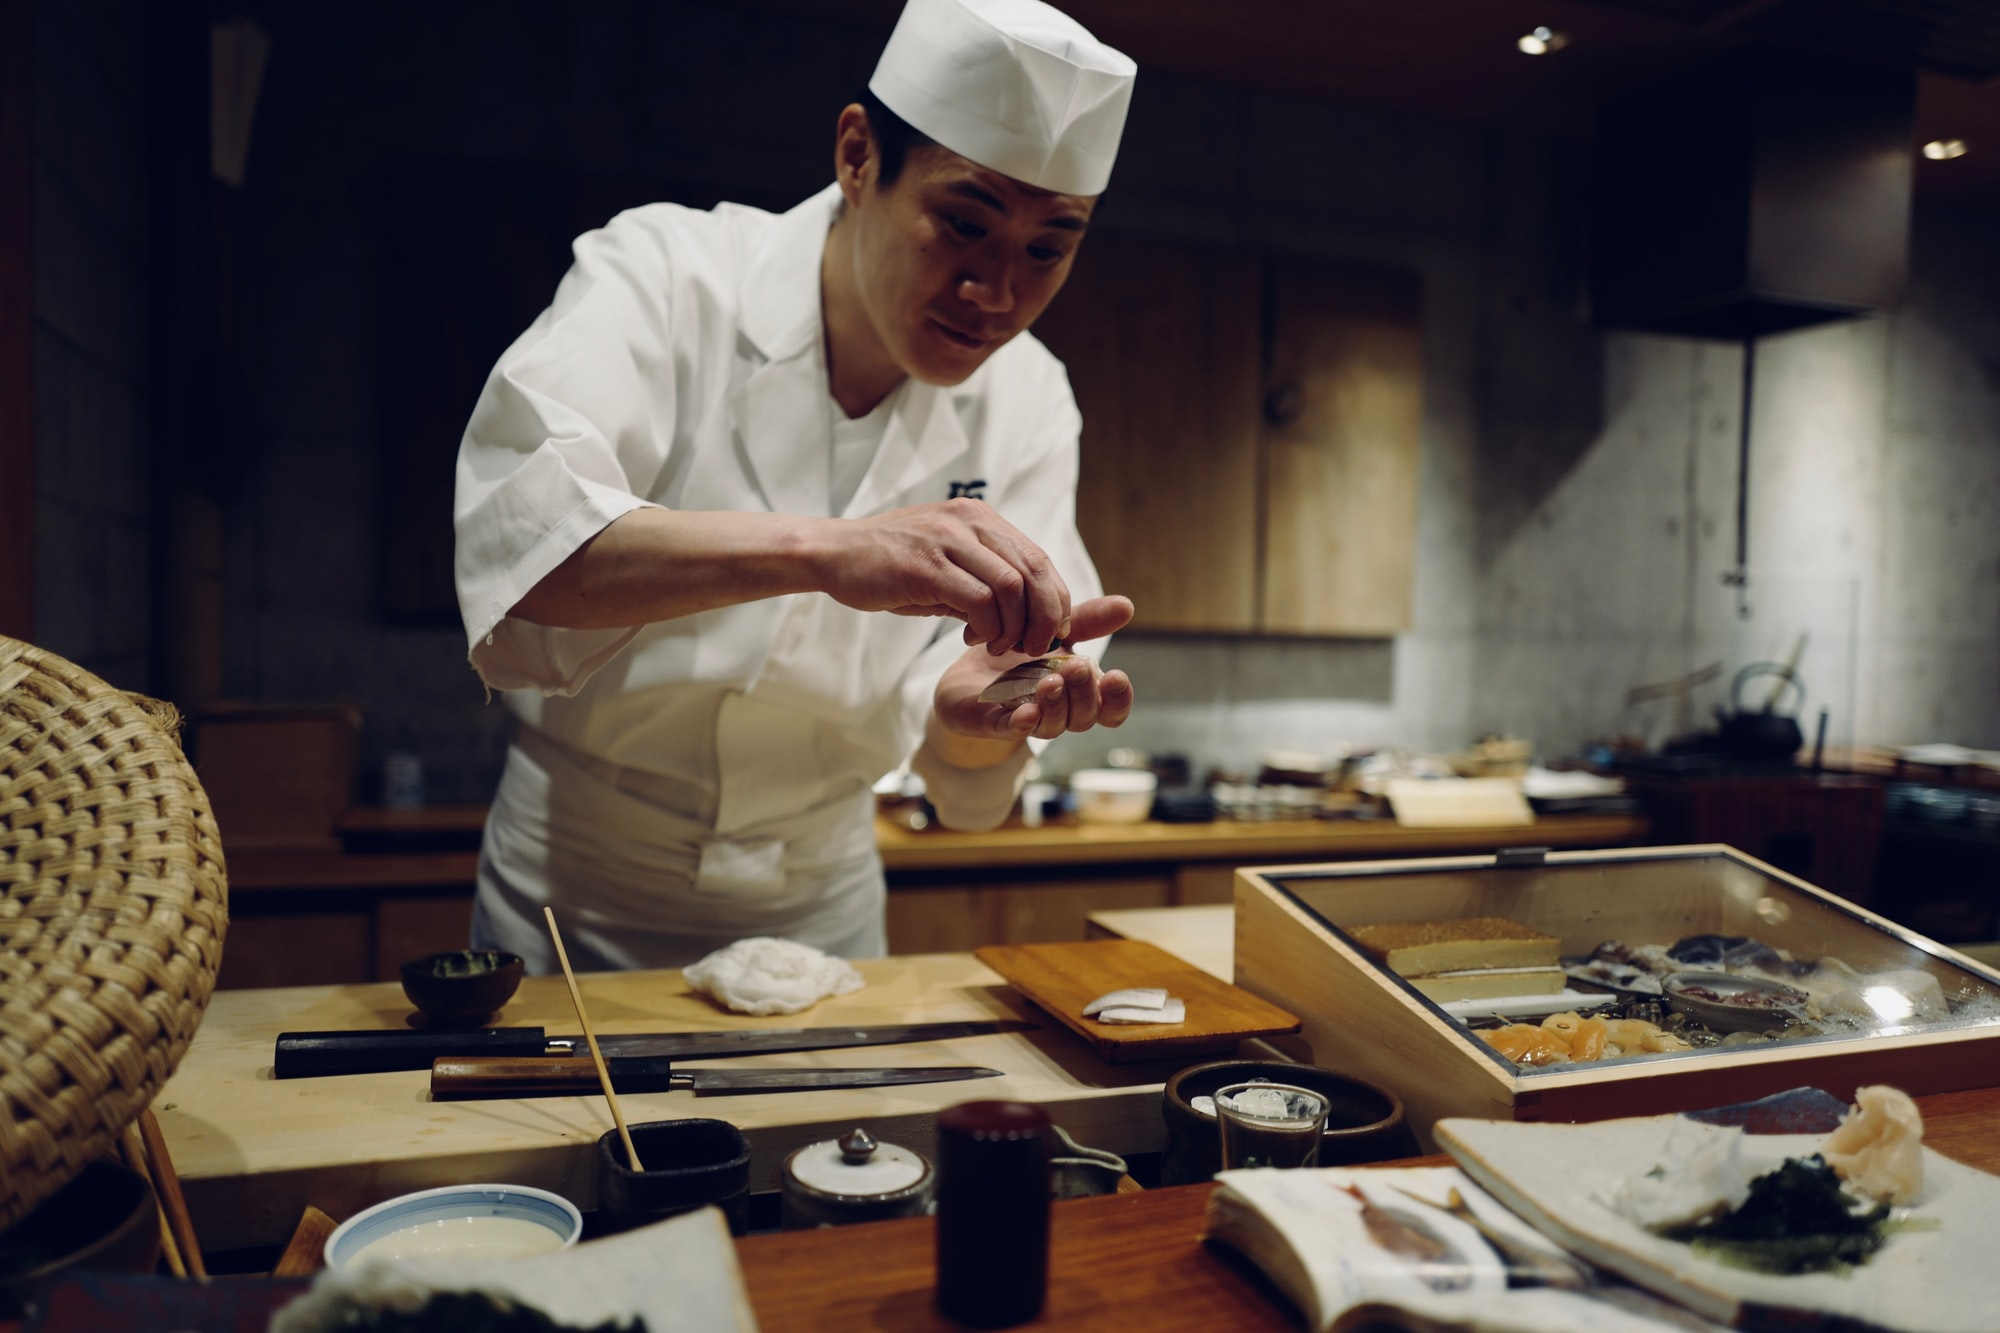 Modelo de cardápio para dieta japonesa